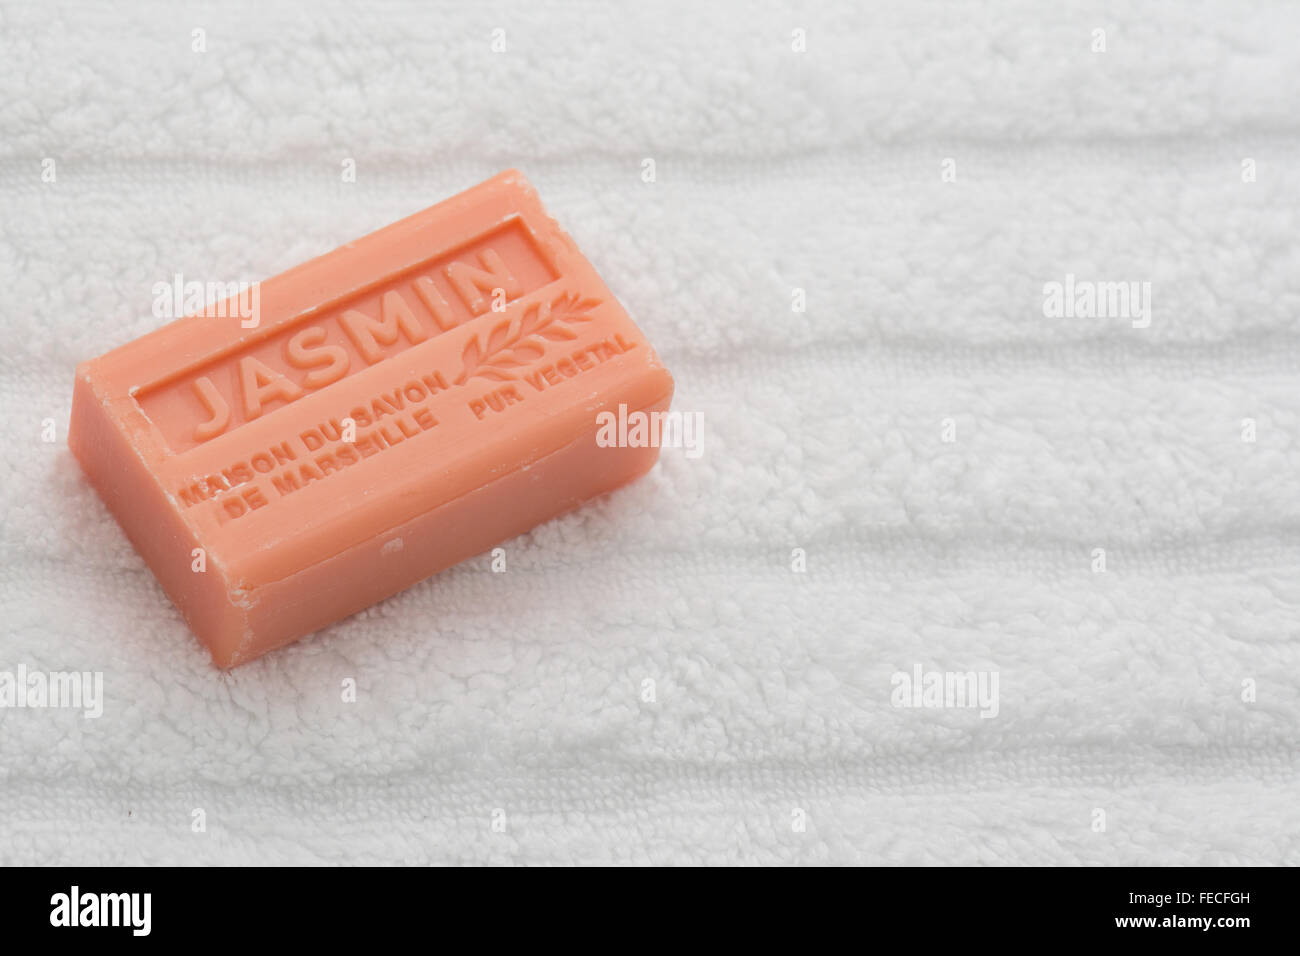 La Maison du Savon Jasmin French scented soap - Stock Image